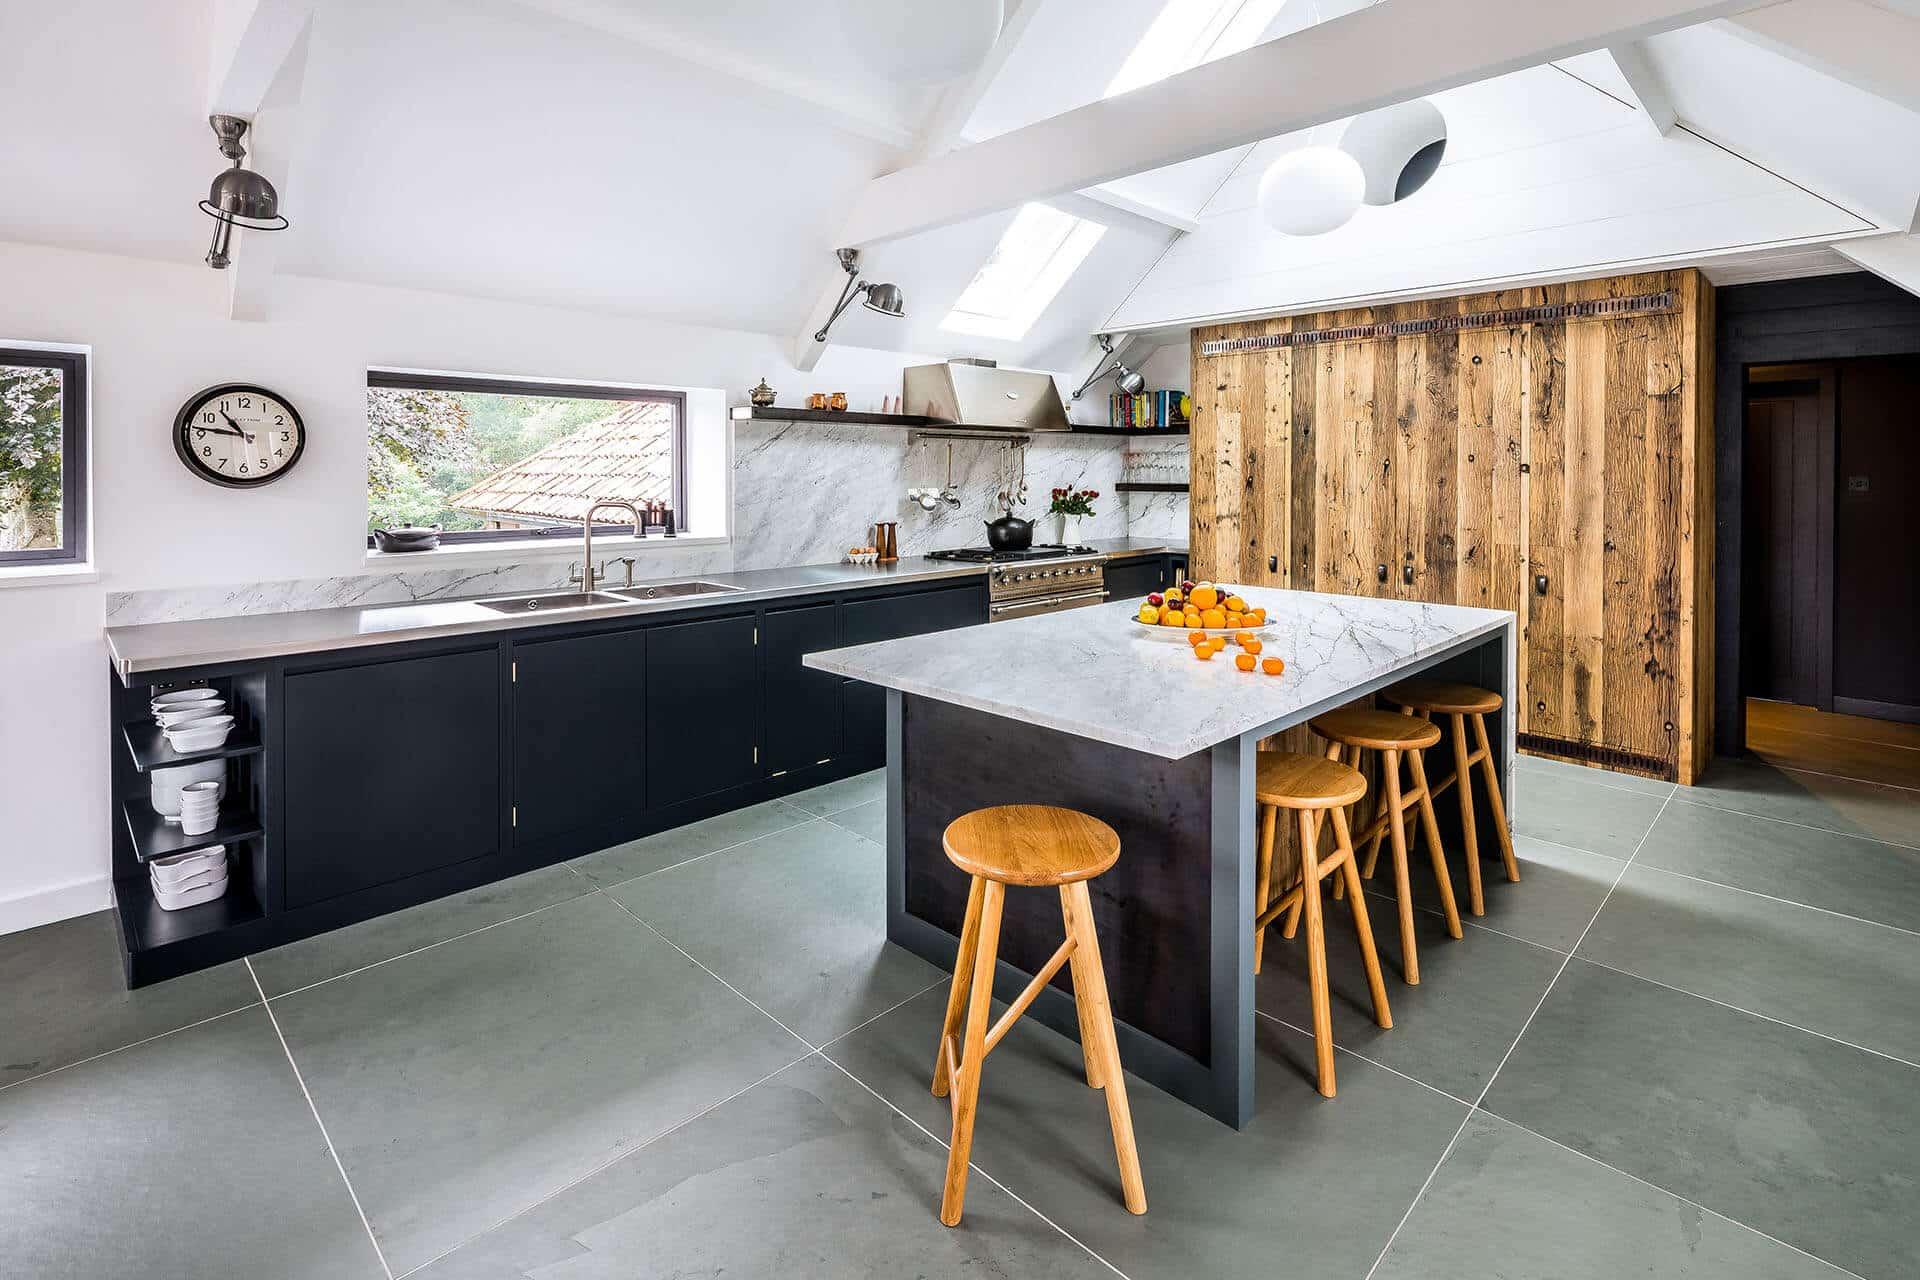 Steel, Marble, Reclaimed Wood Kitchen